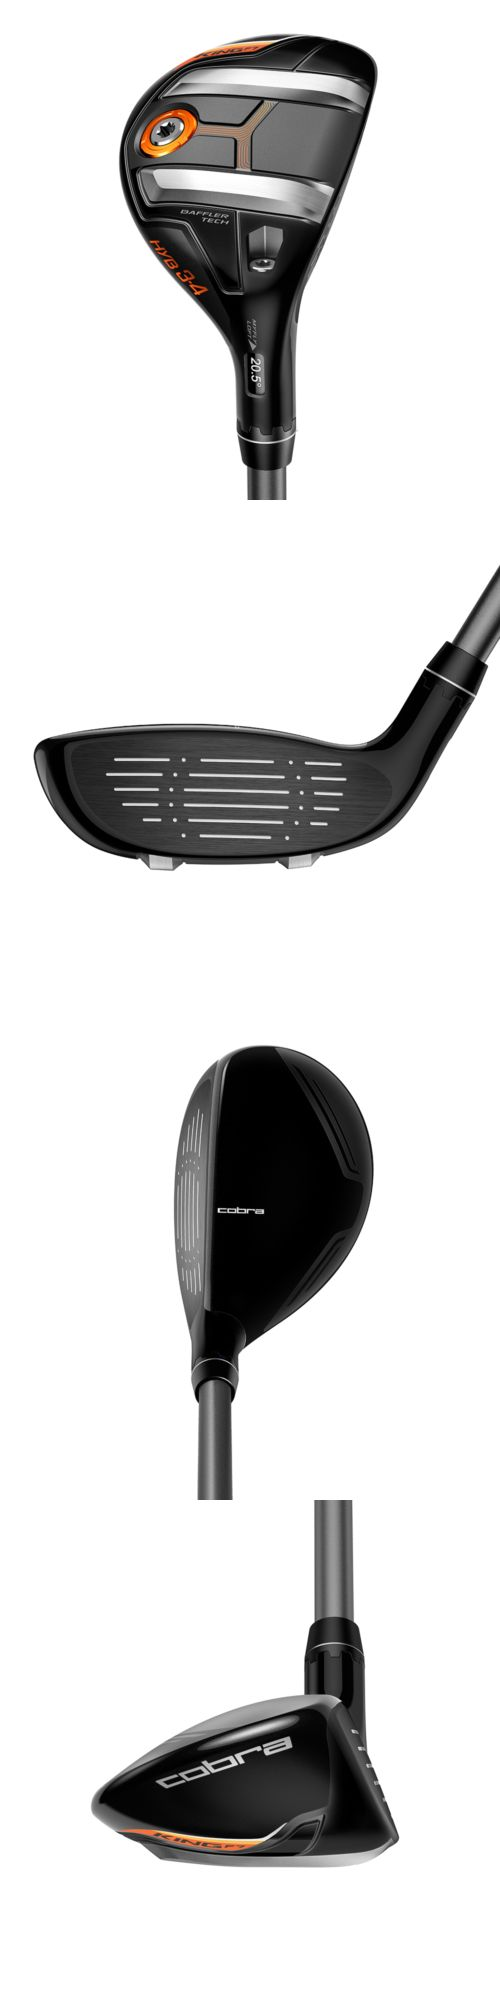 Golf Clubs 115280: New Cobra Golf King F7 Hybrid #2 3 Stiff Flex Black -> BUY IT NOW ONLY: $149.99 on eBay!